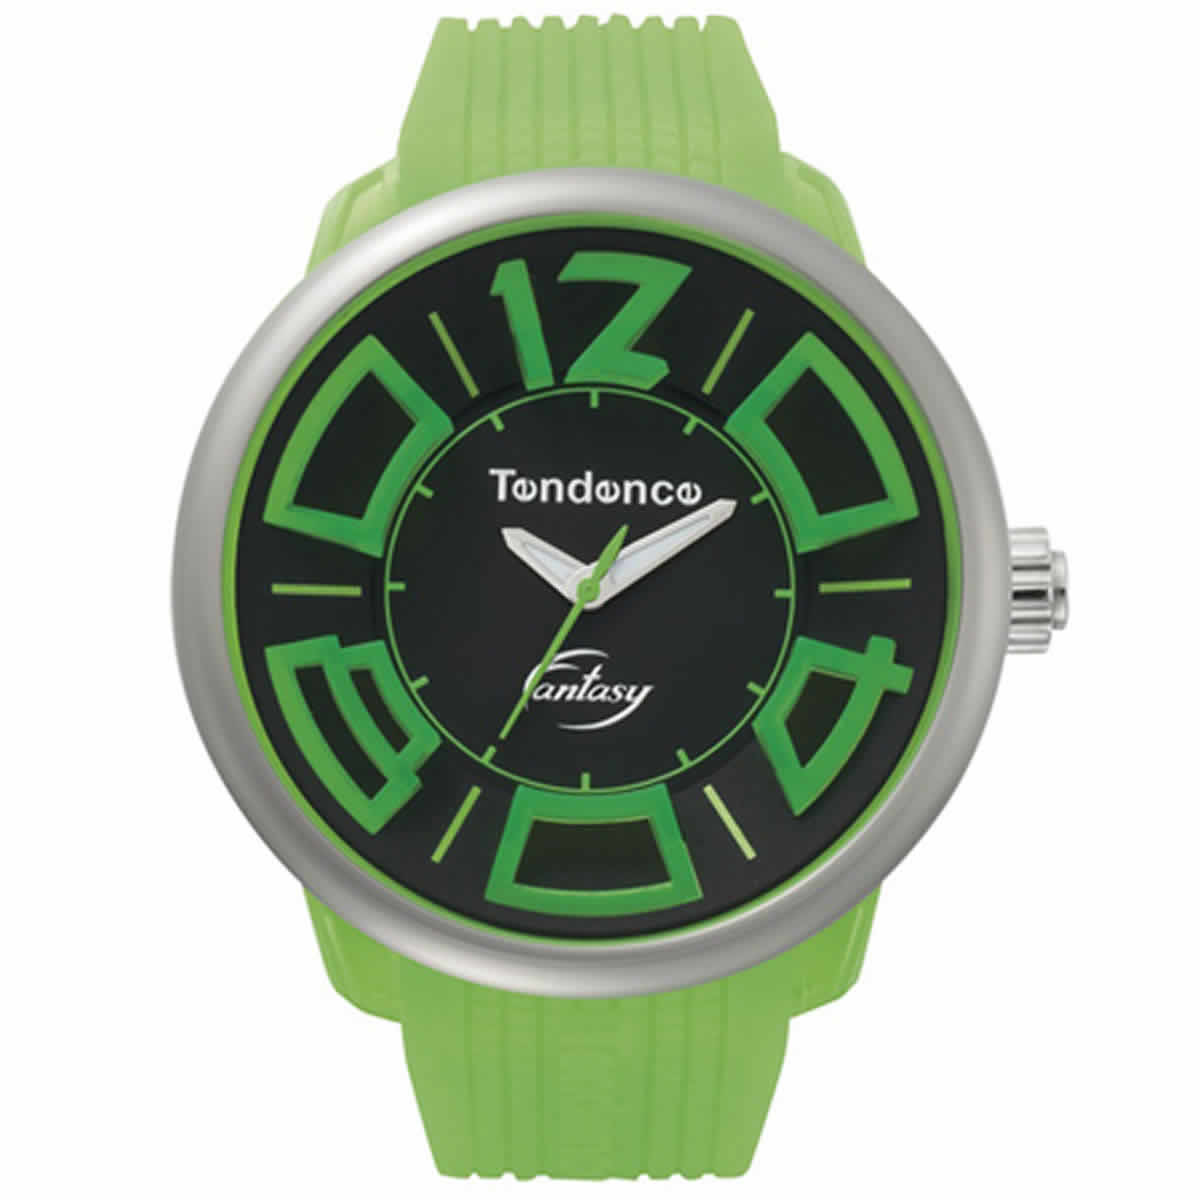 Tendence(テンデンス)FANTASY(ファンタジー)FLUO TG632003 グリーン×ブラック